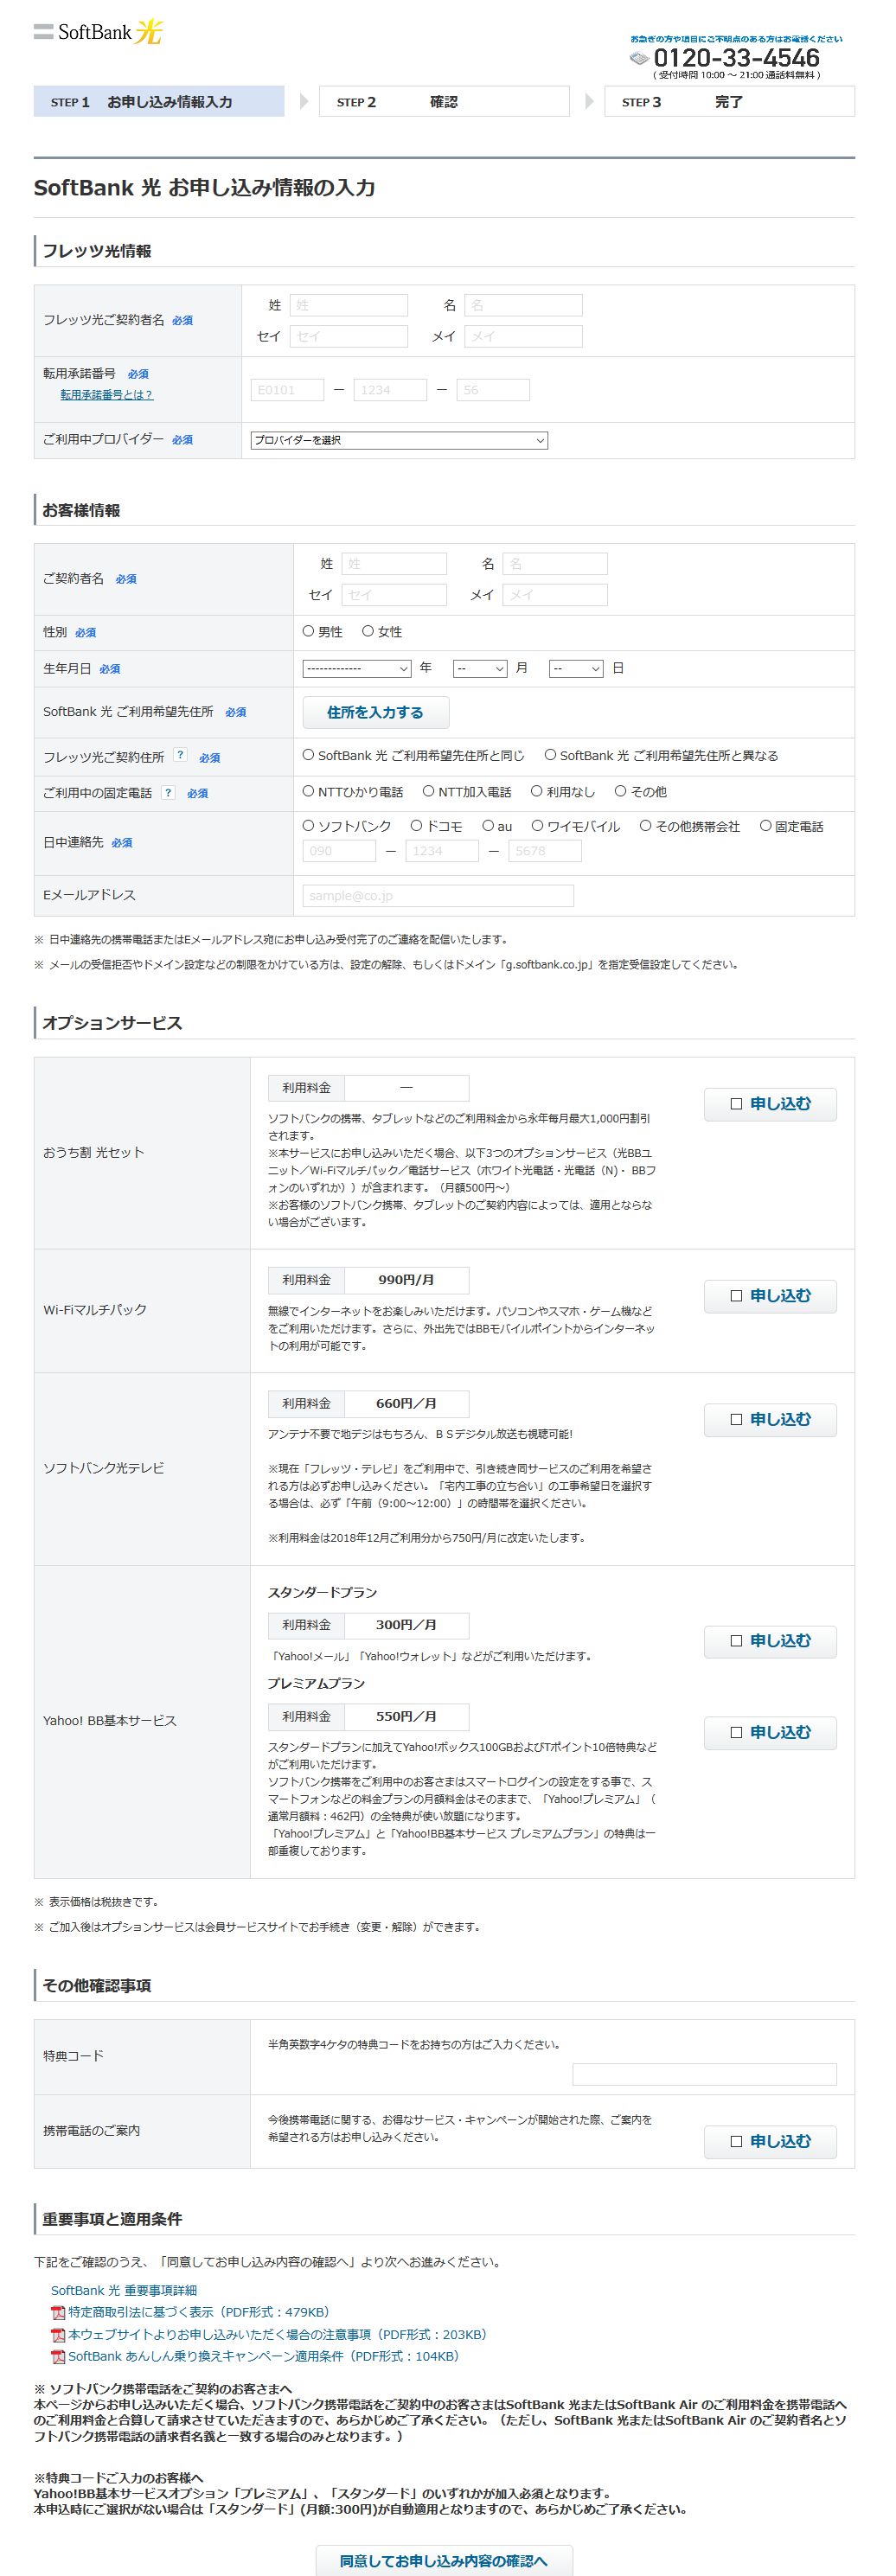 SoftBank光 お申込情報